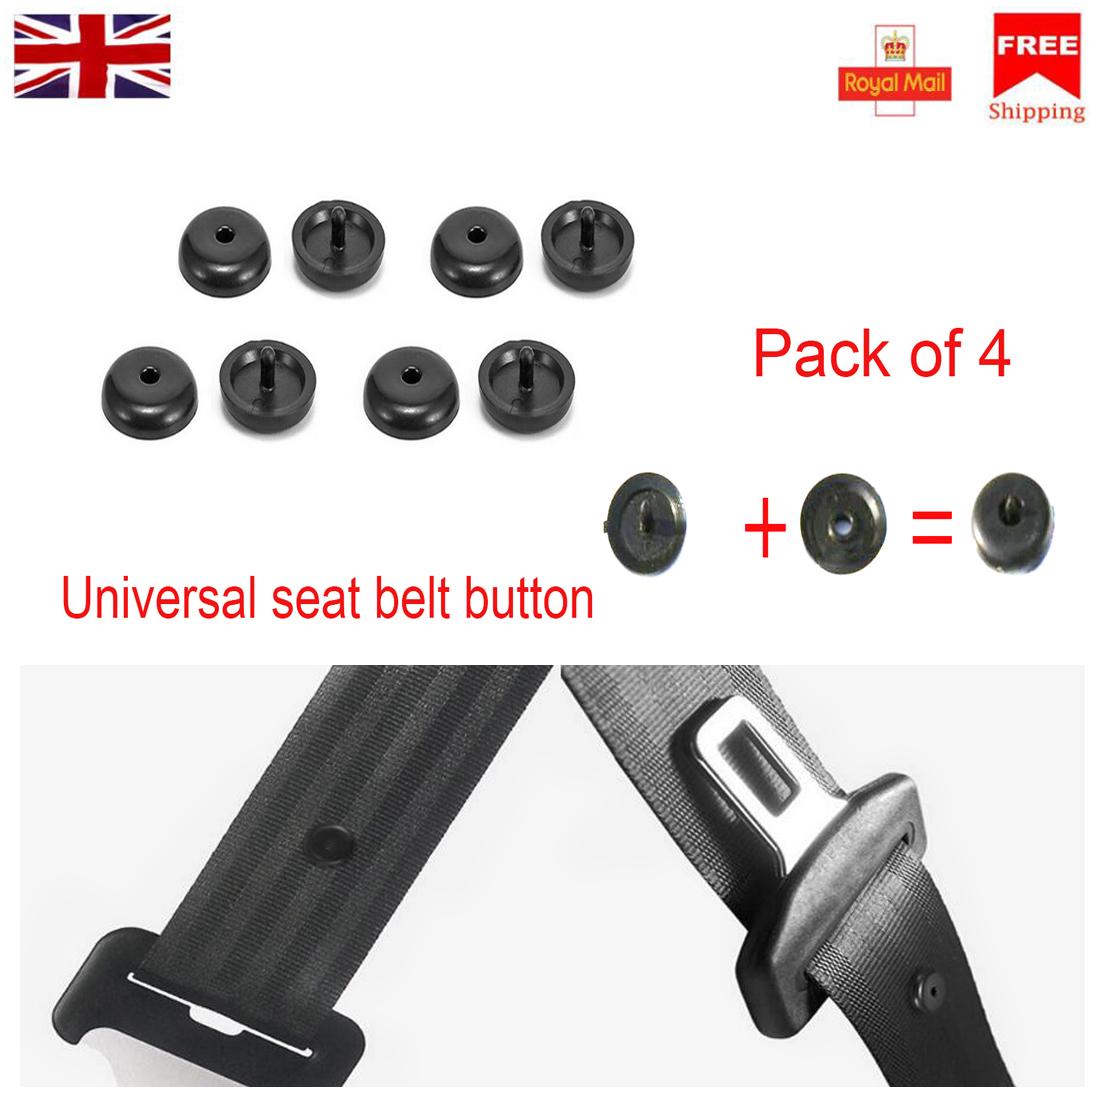 1x Seat Belt Stopper Clip For RENAULT SAAB SEAT SKODA KIA Buckle holder Stud Pin